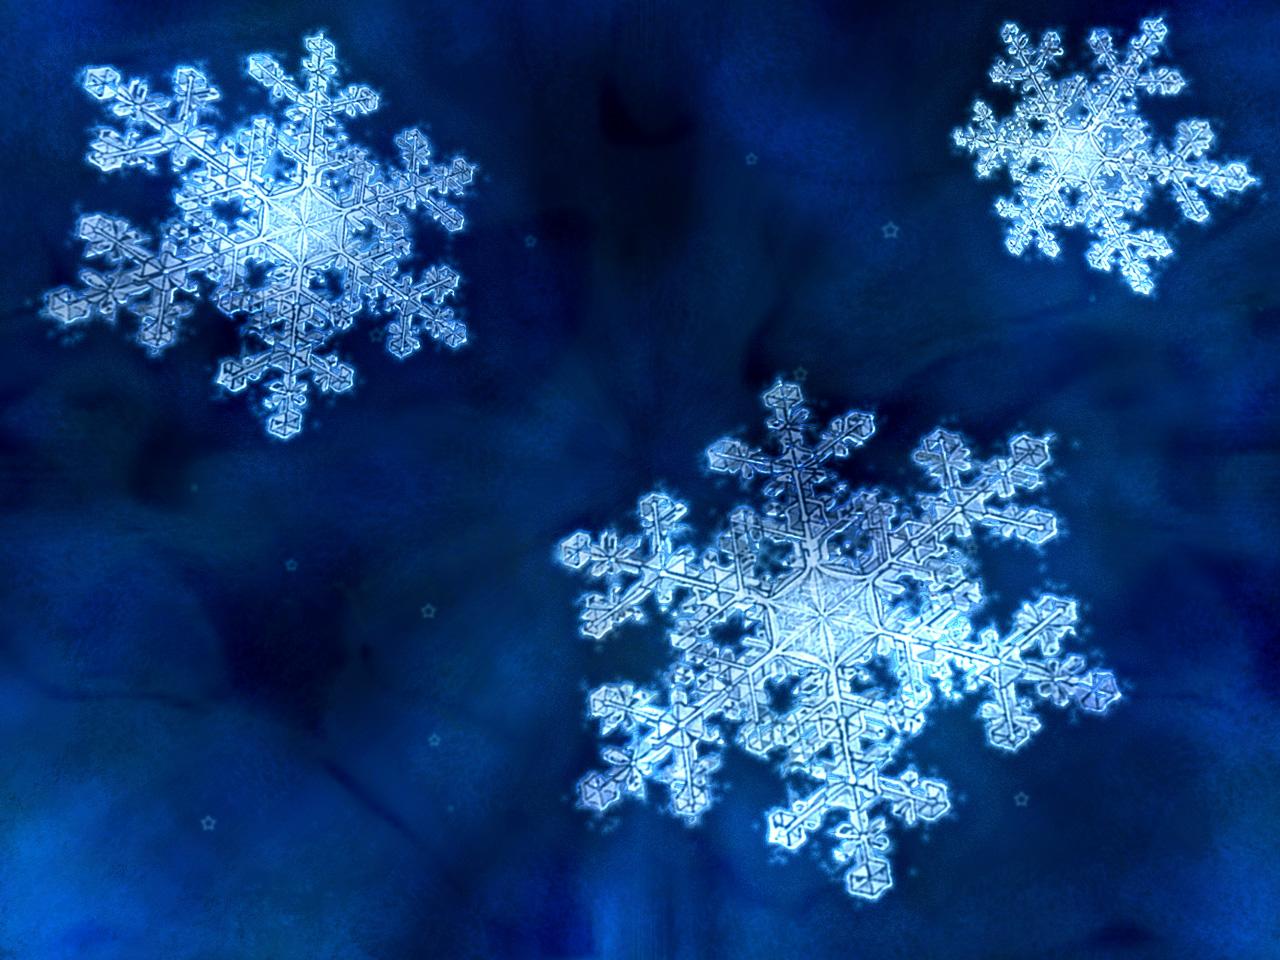 http://3.bp.blogspot.com/_X0LW-gWMBAs/TUr_kJyYu1I/AAAAAAAABKM/bPdza2P58jo/s1600/wallpaper_winter.jpg